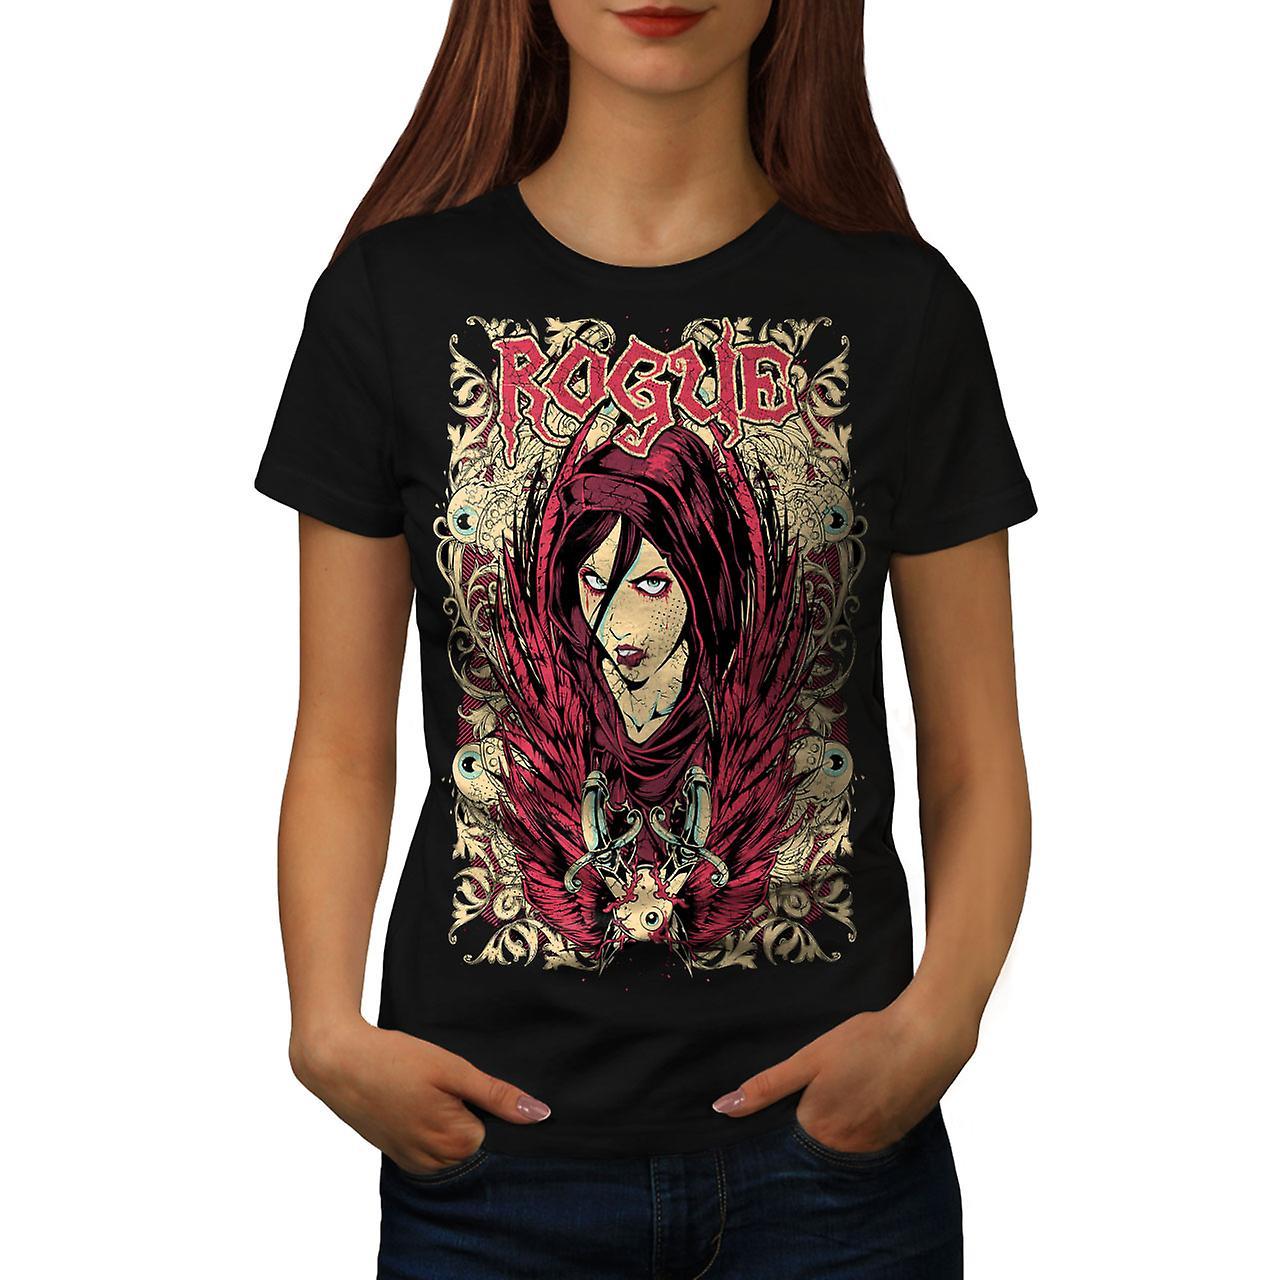 Girl Goth Punk Fashion Women Black T-shirt | Wellcoda